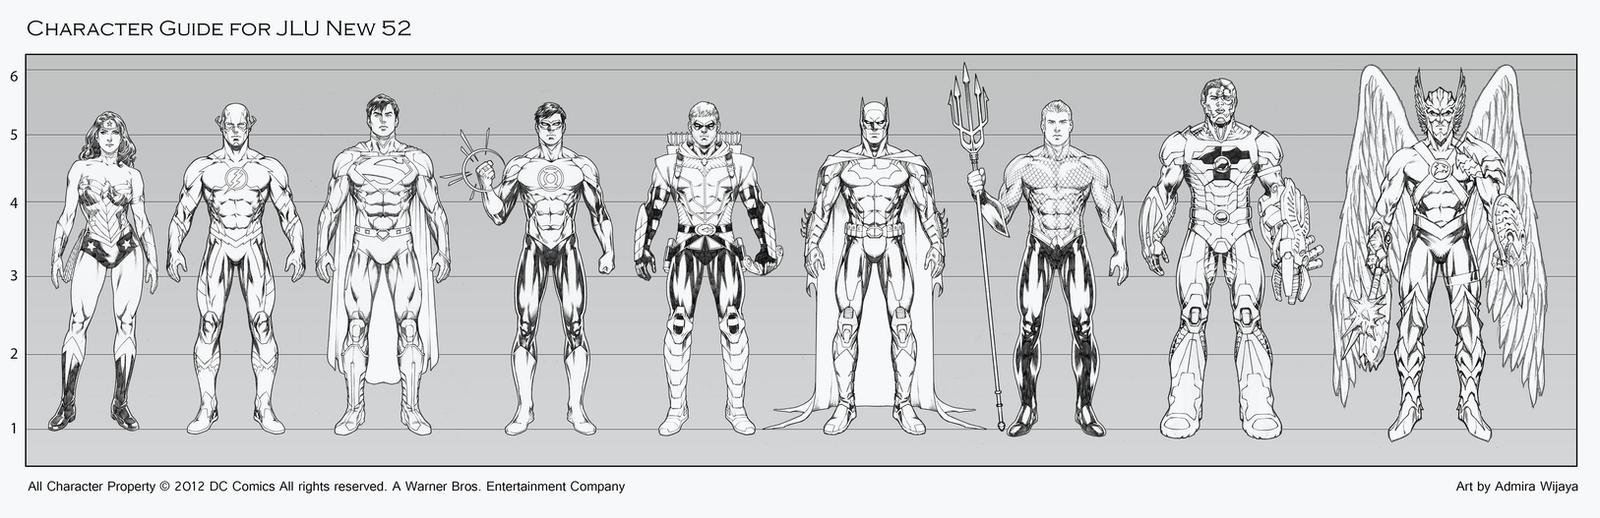 JLU Character Guide new 52 by AdmiraWijaya